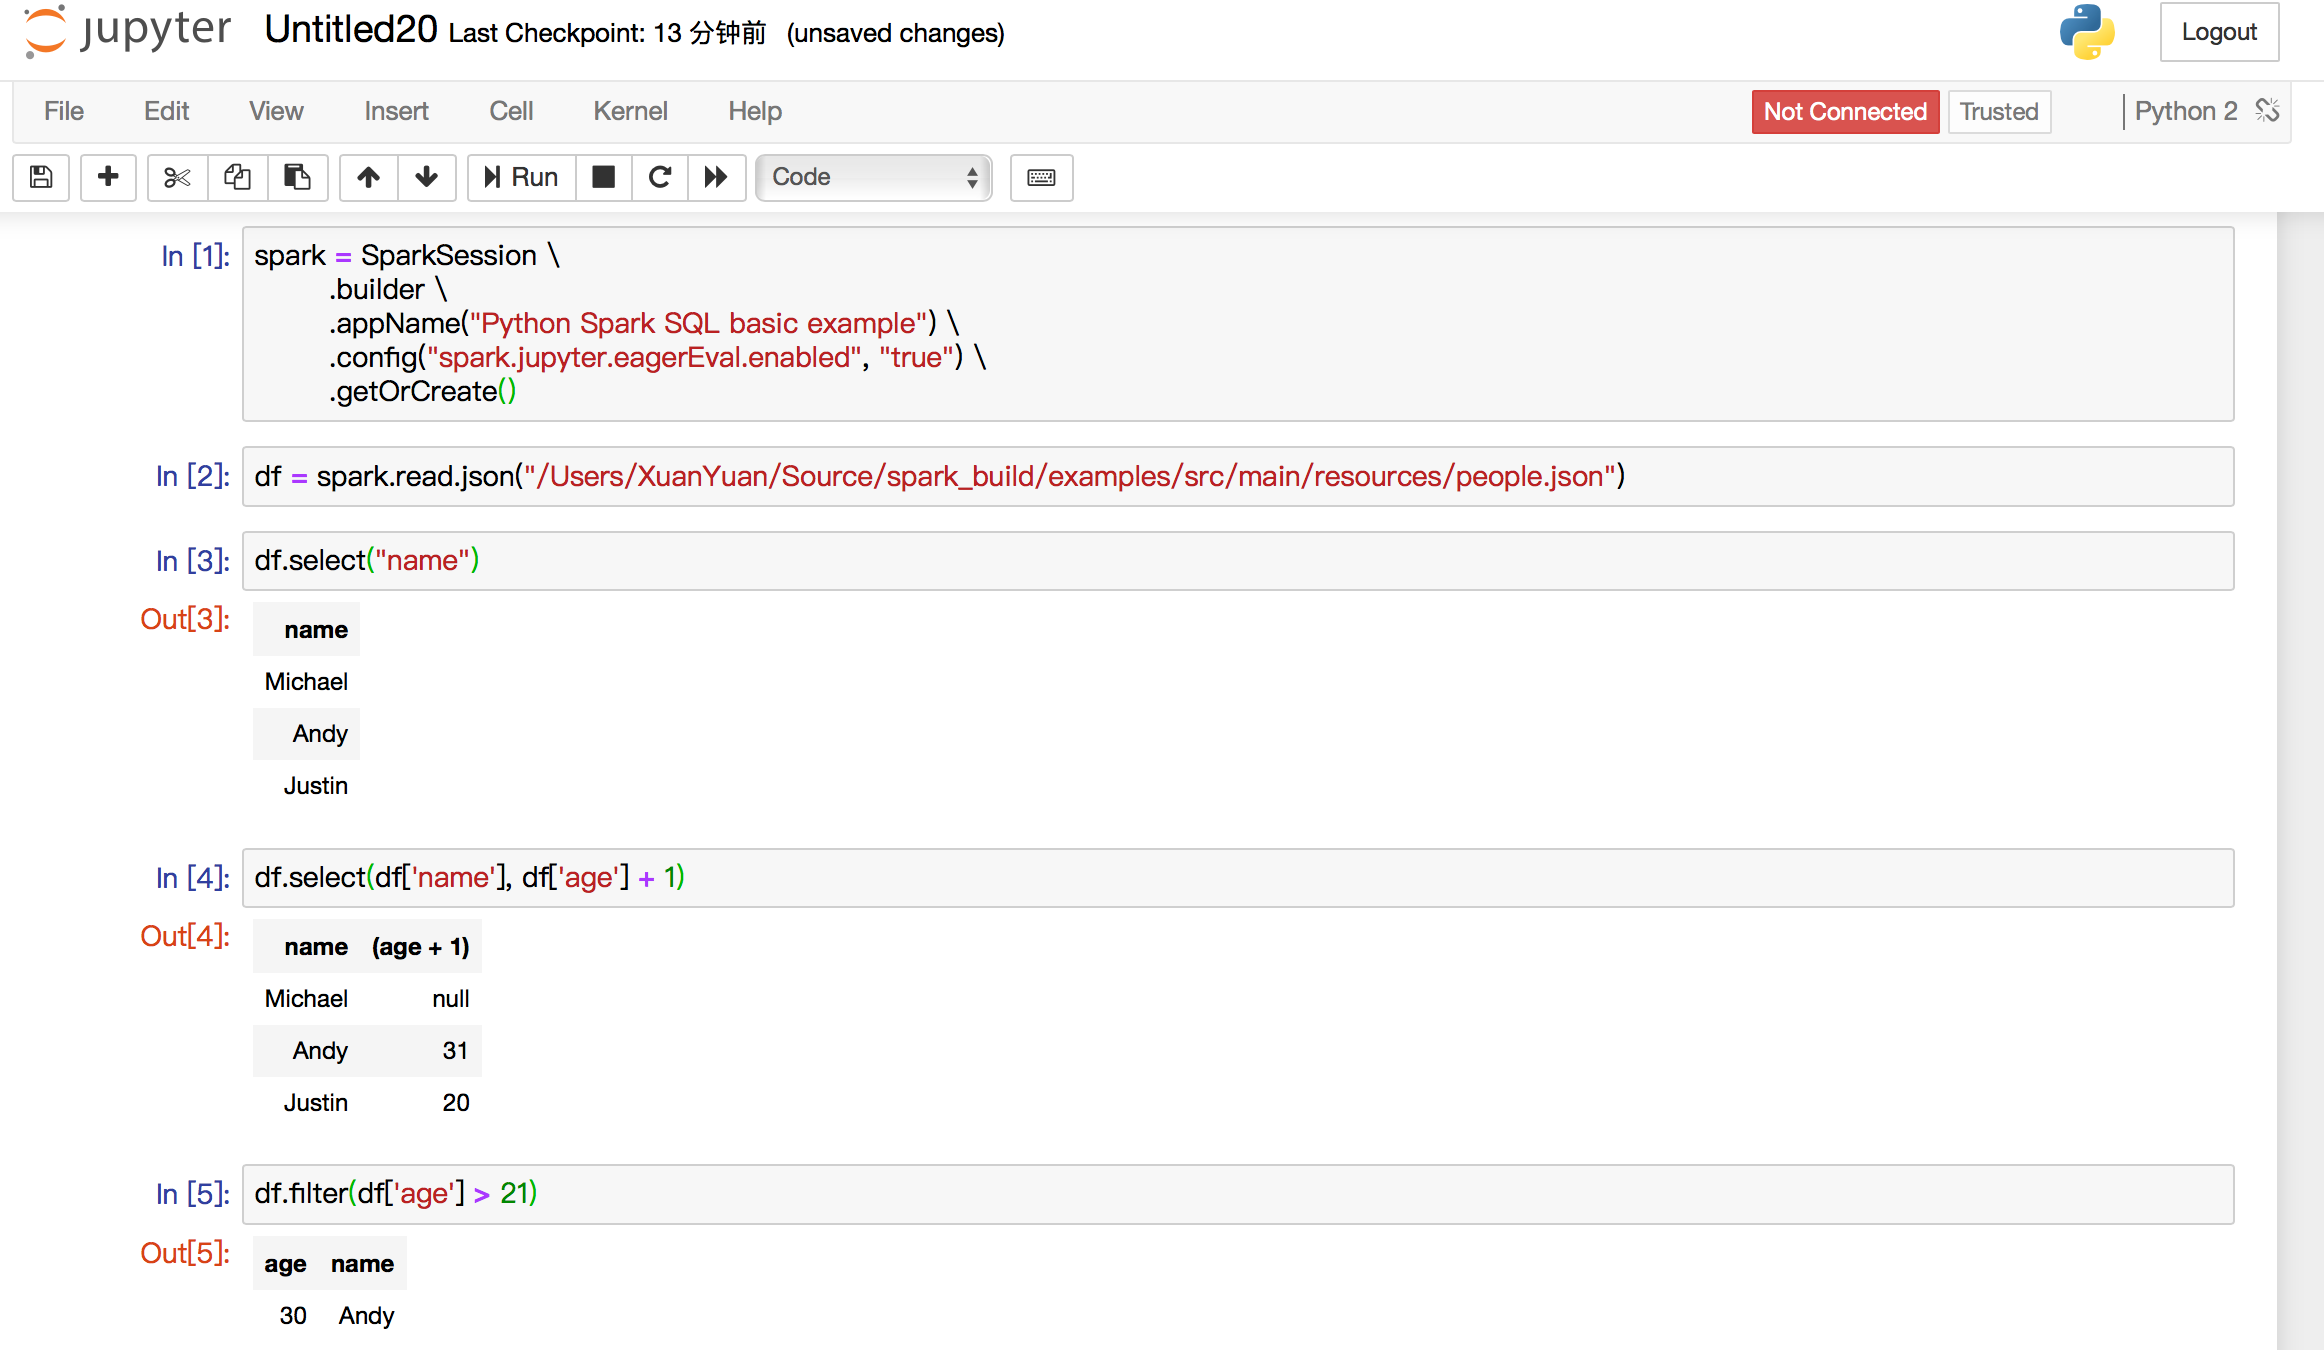 spark git commit: [SPARK-24215][PYSPARK] Implement _repr_html_ for